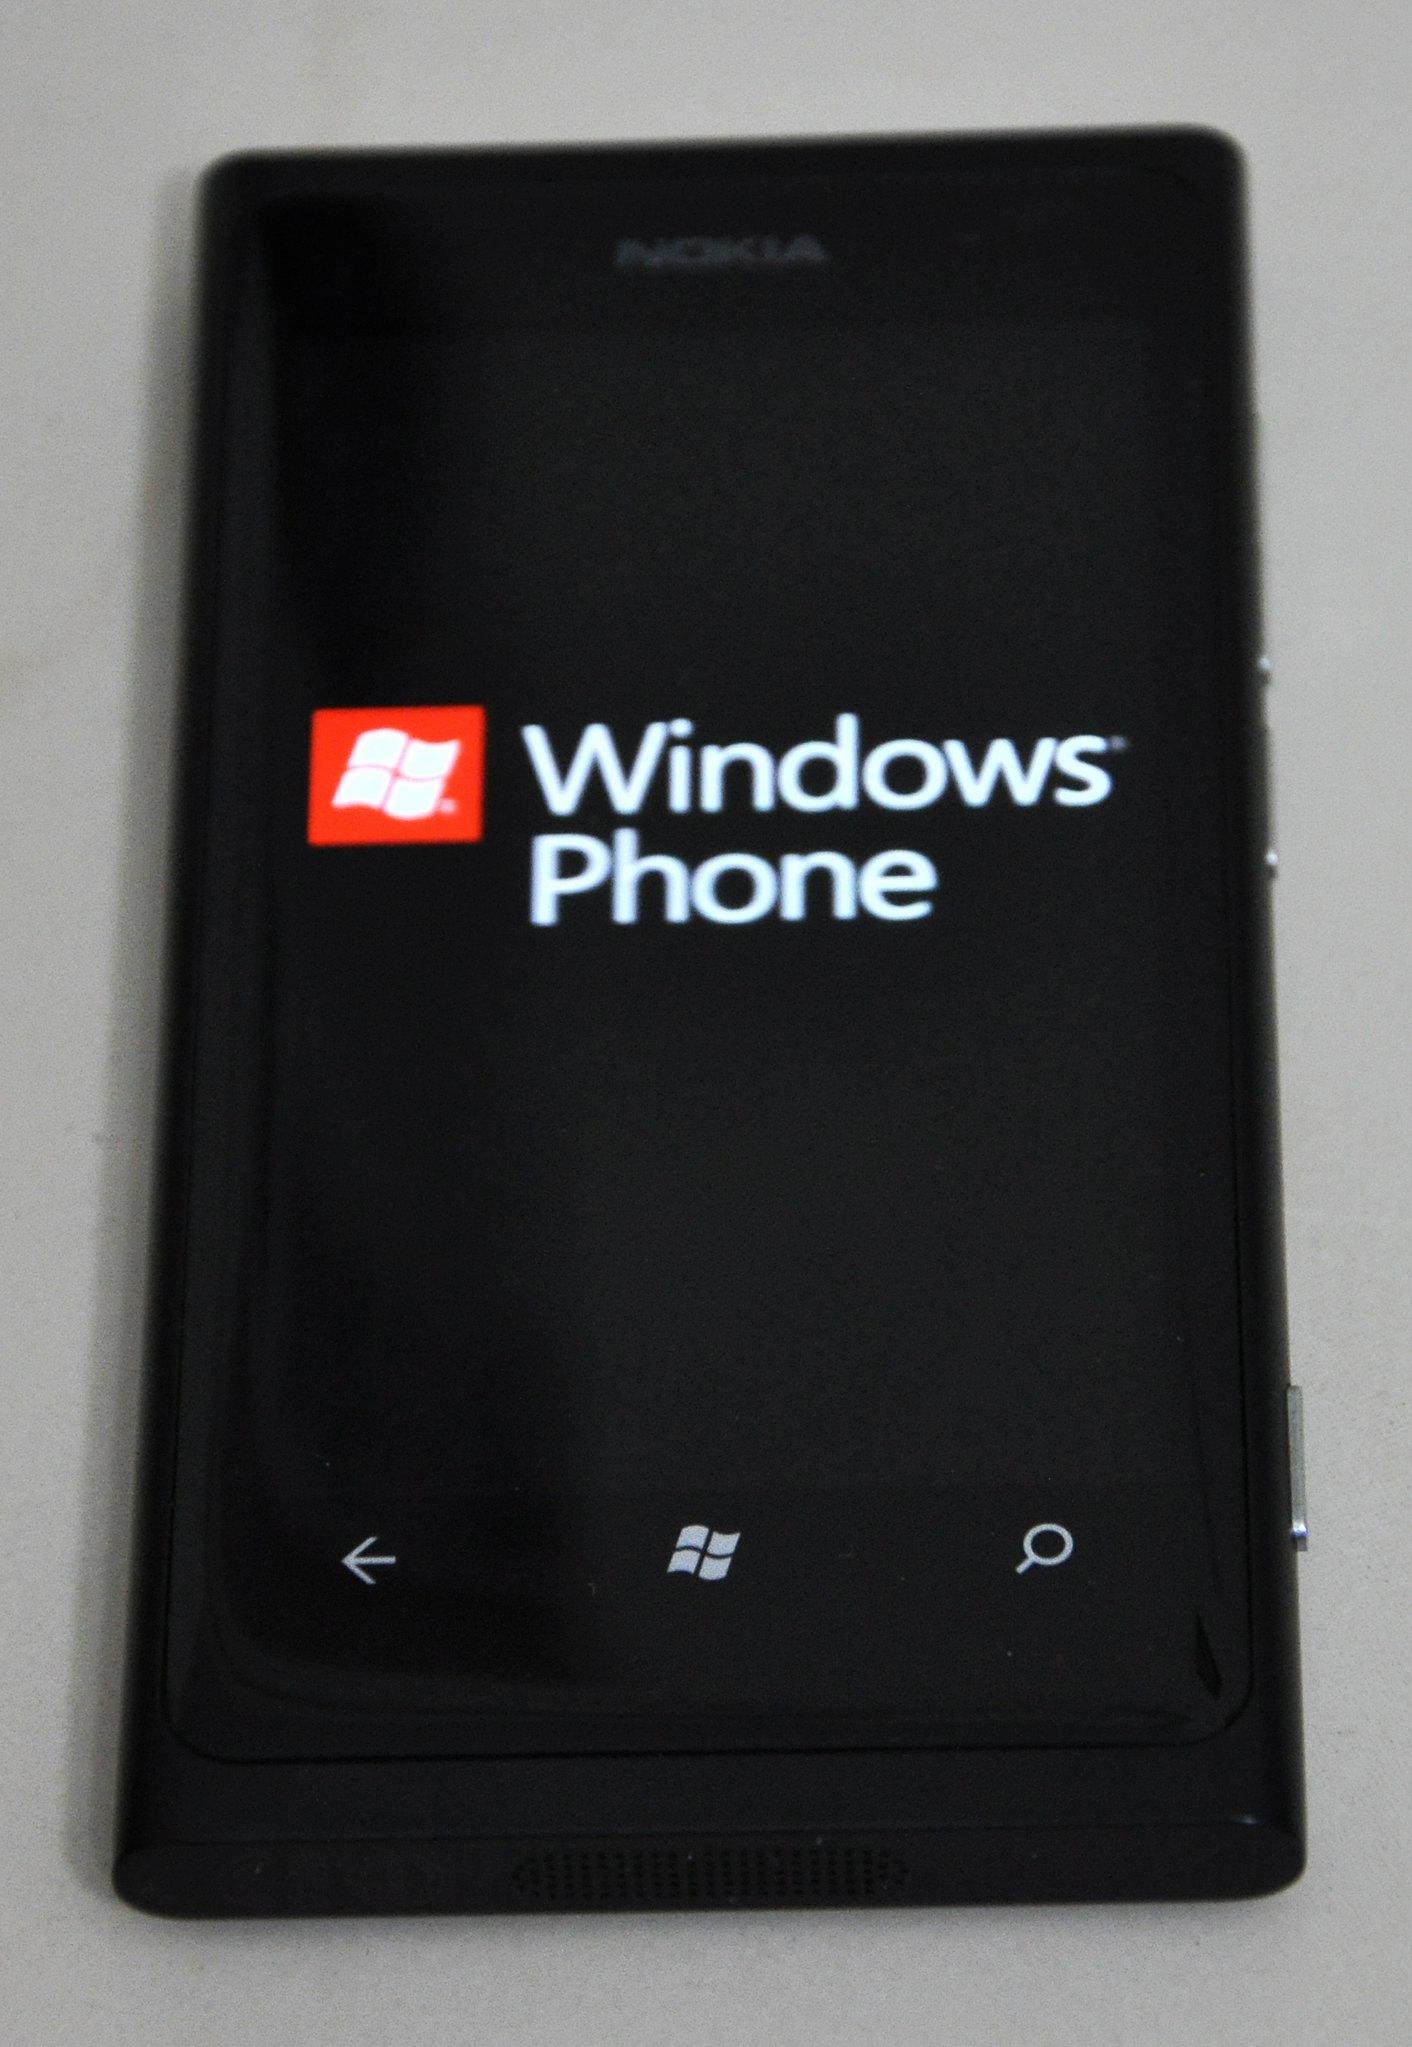 Nokia and Windows Phone